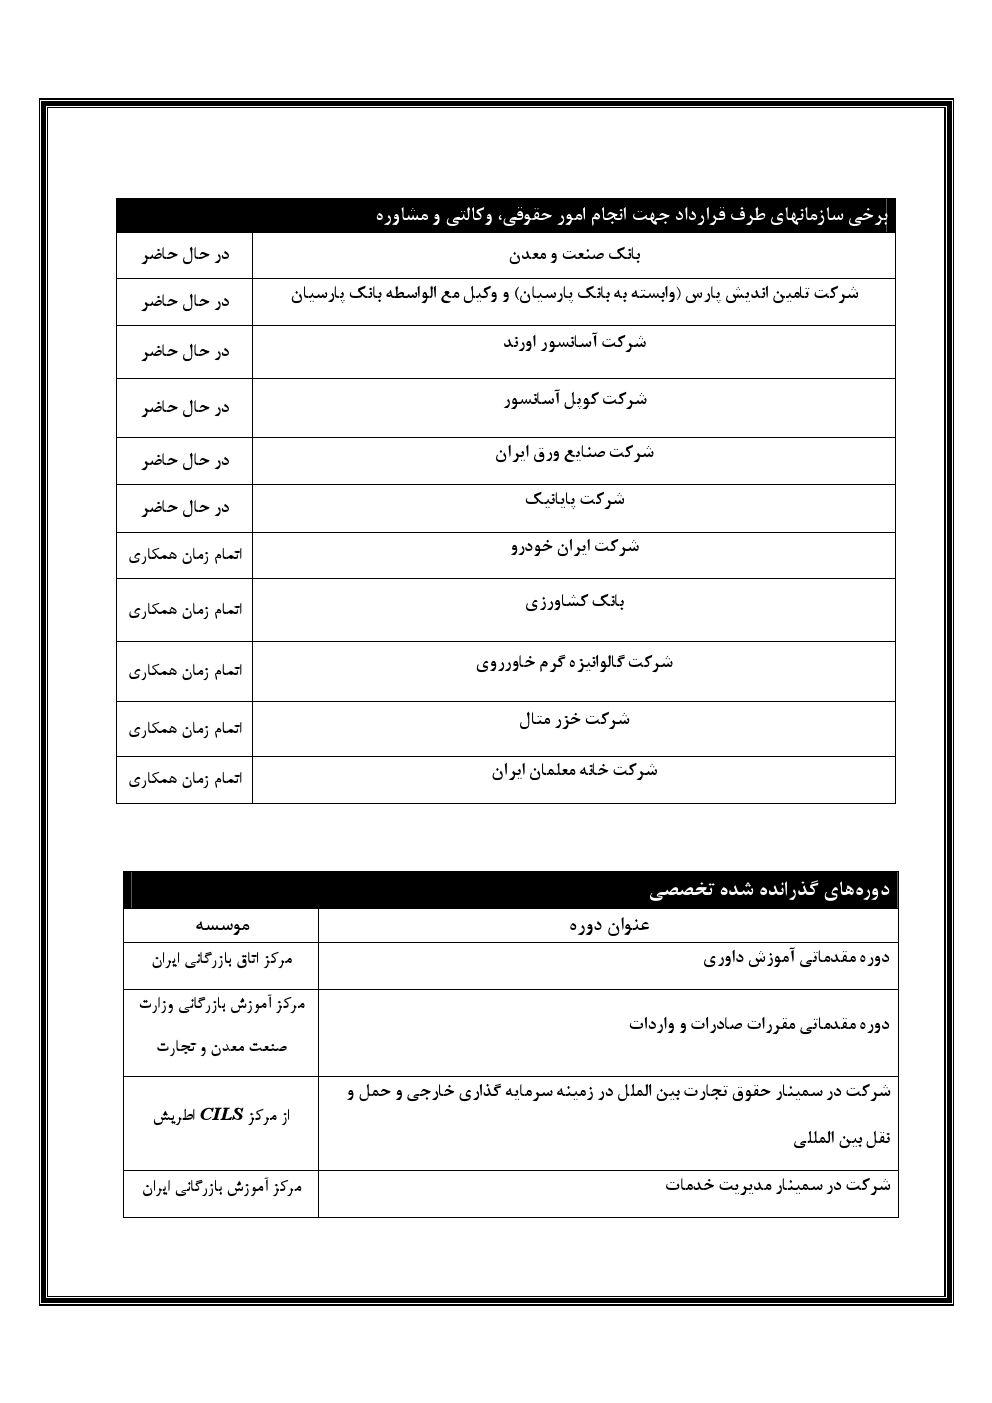 Resume farsi Reza 2 2 - معرفی